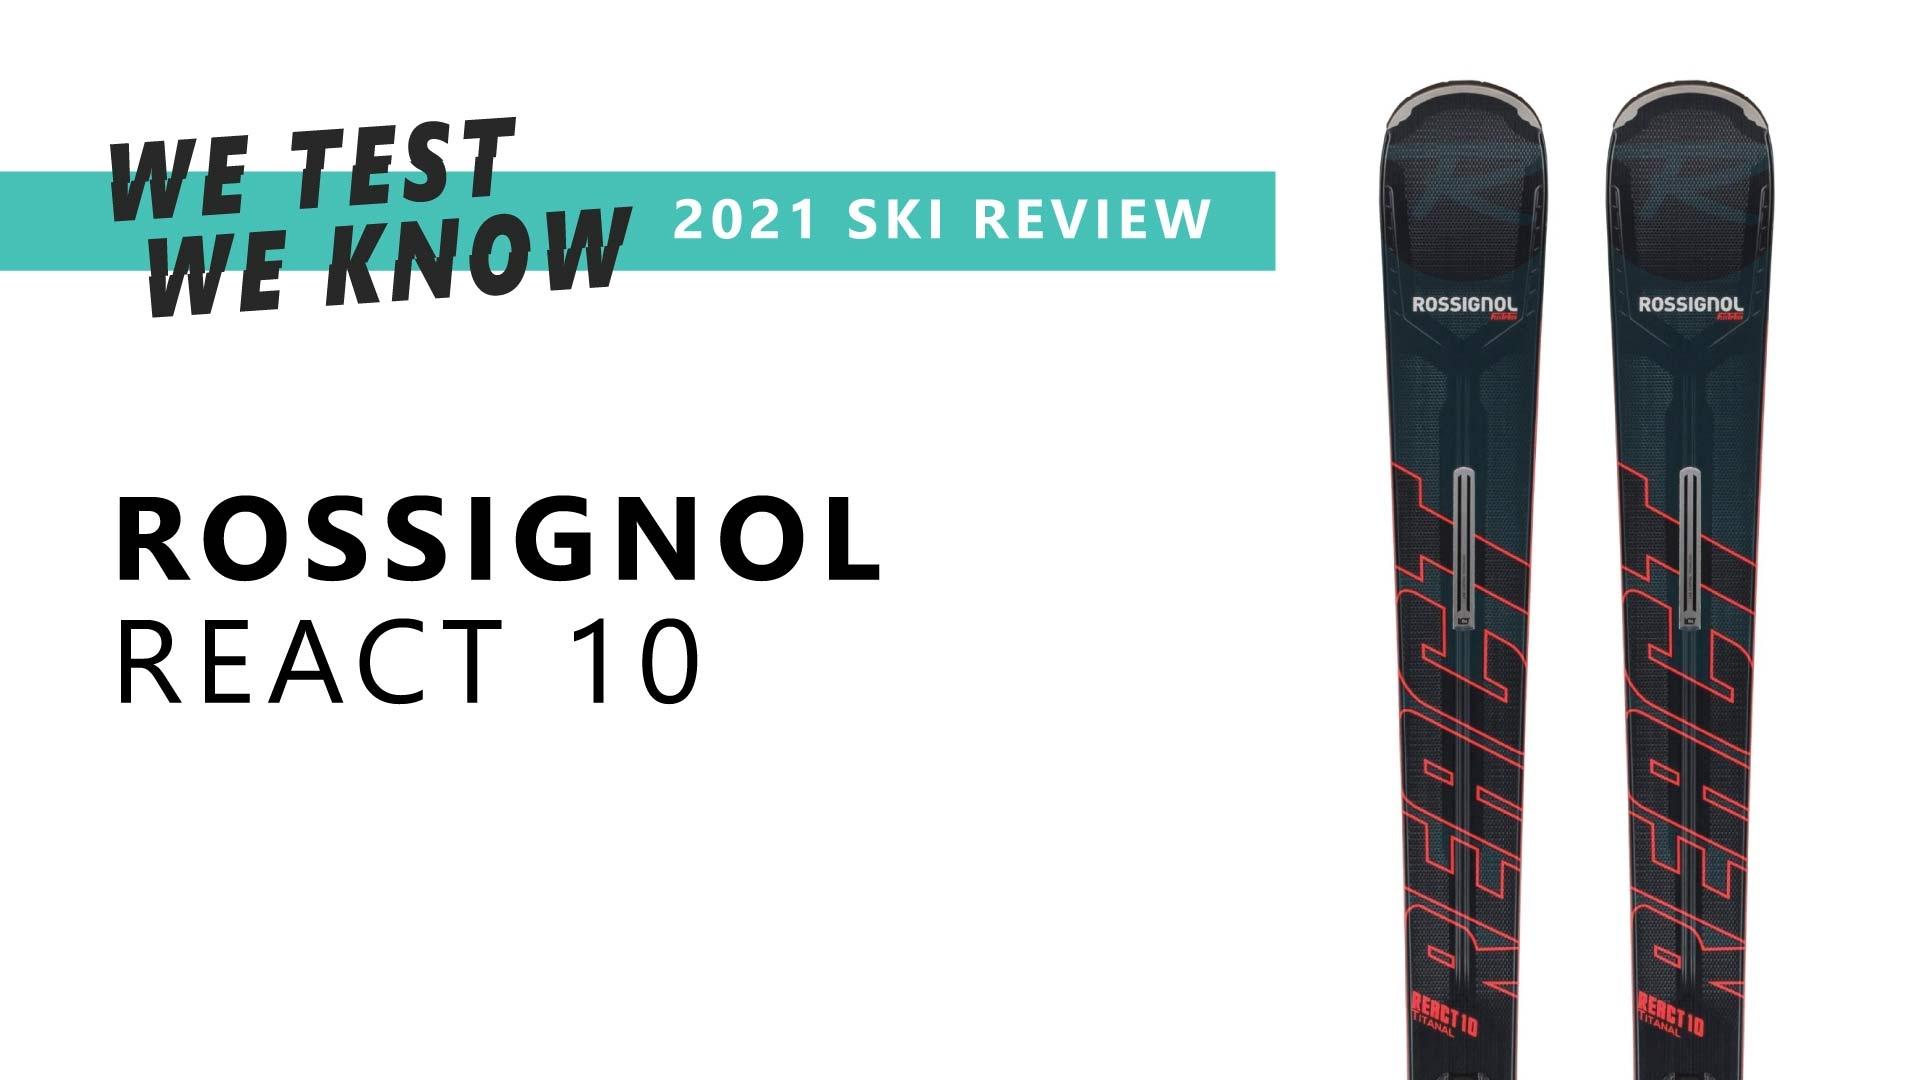 ROSSIGNOL REACT 10 | 2021 SKI REVIEW